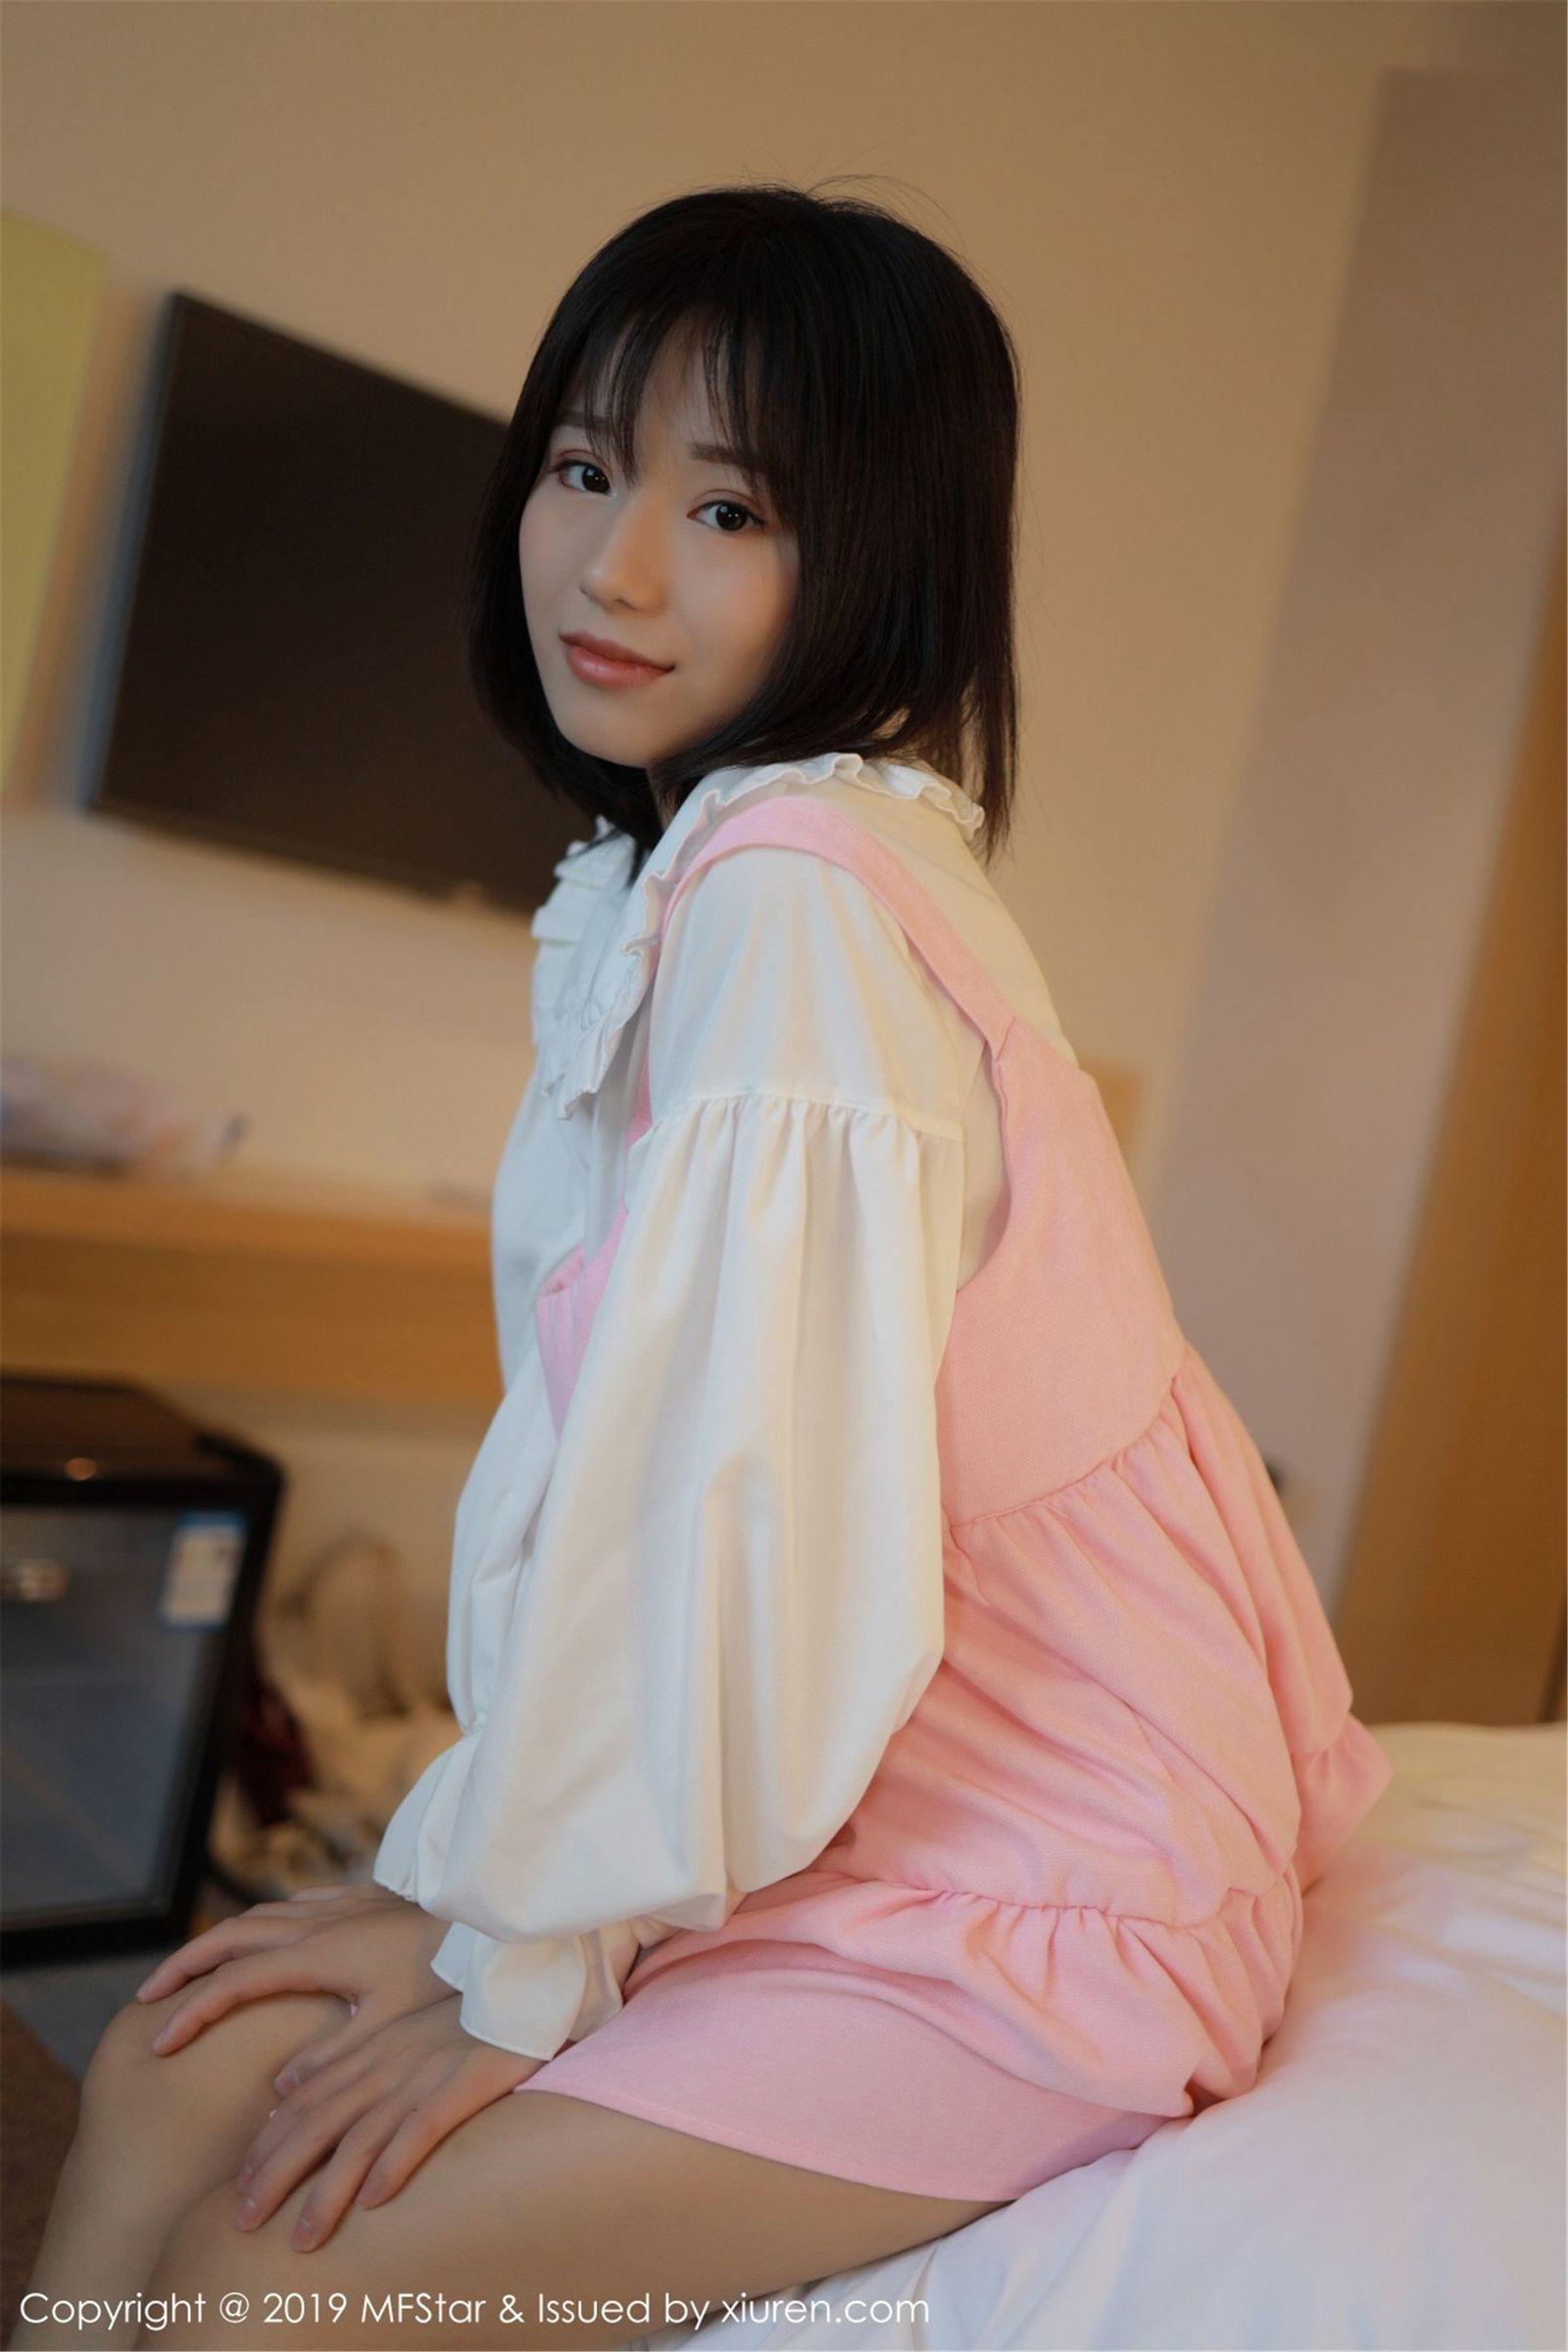 [MFStar模范学院] Vol.203 Baileys香儿 - 粉丝内衣与白衬衫系列[63P]